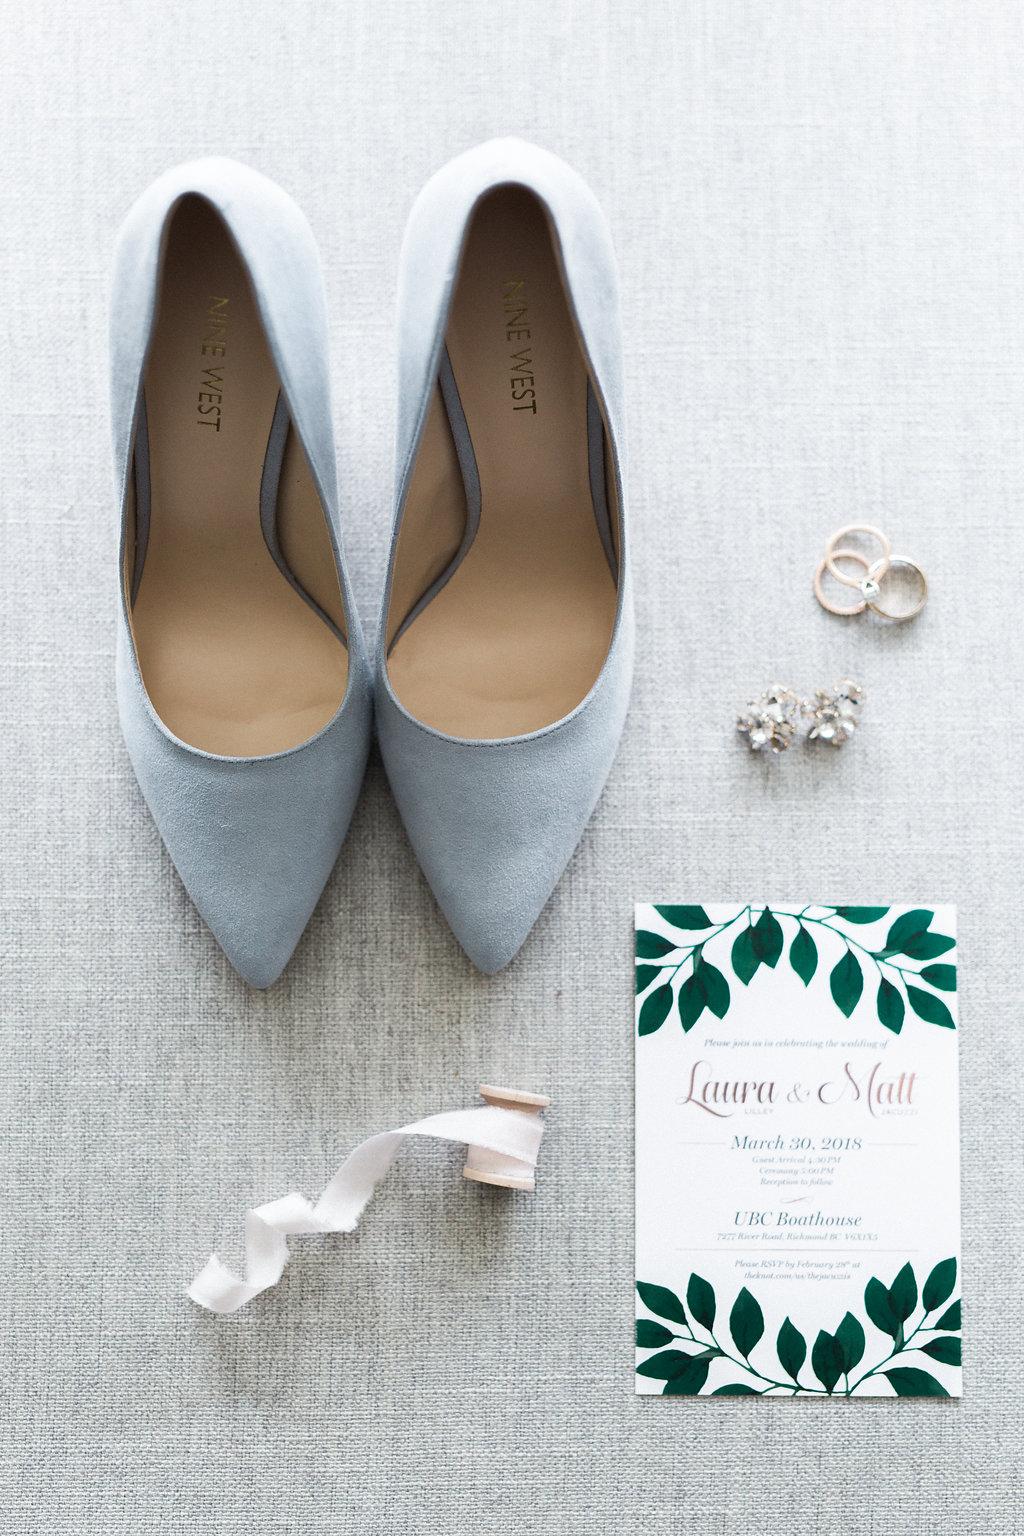 Vancouver Wedding Planner UBC Boathouse Wedding - L&M1.jpg